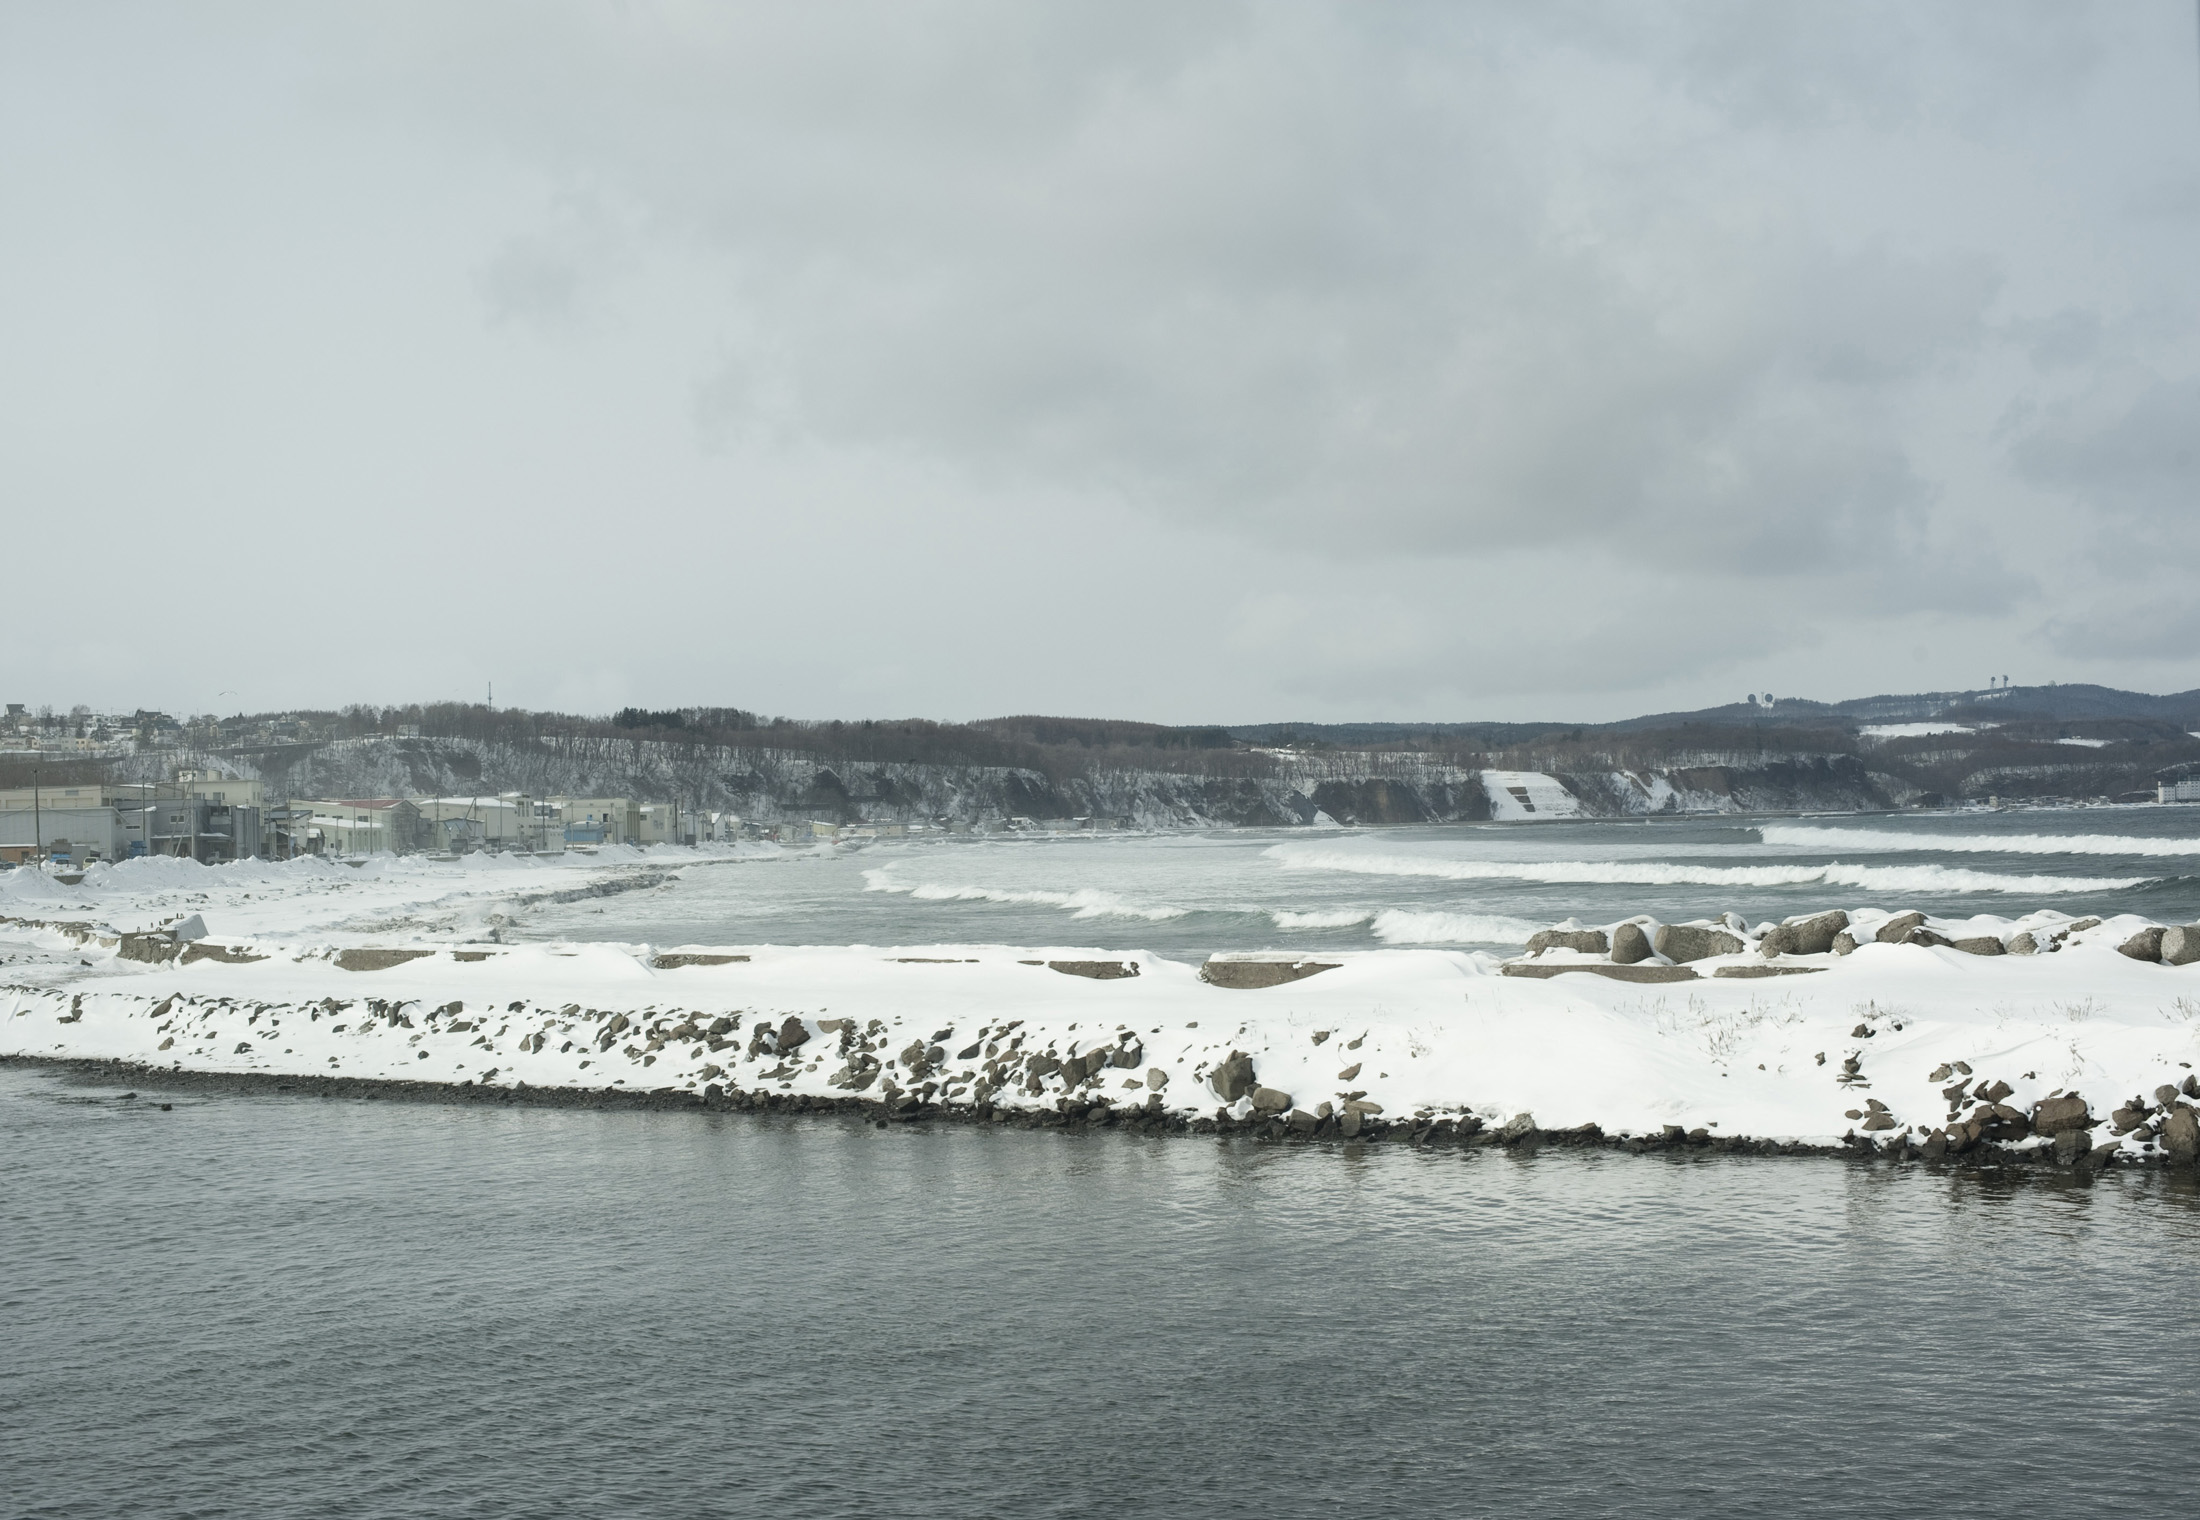 Free stock photo of abashiri coast photoeverywhere for Winter vacation east coast